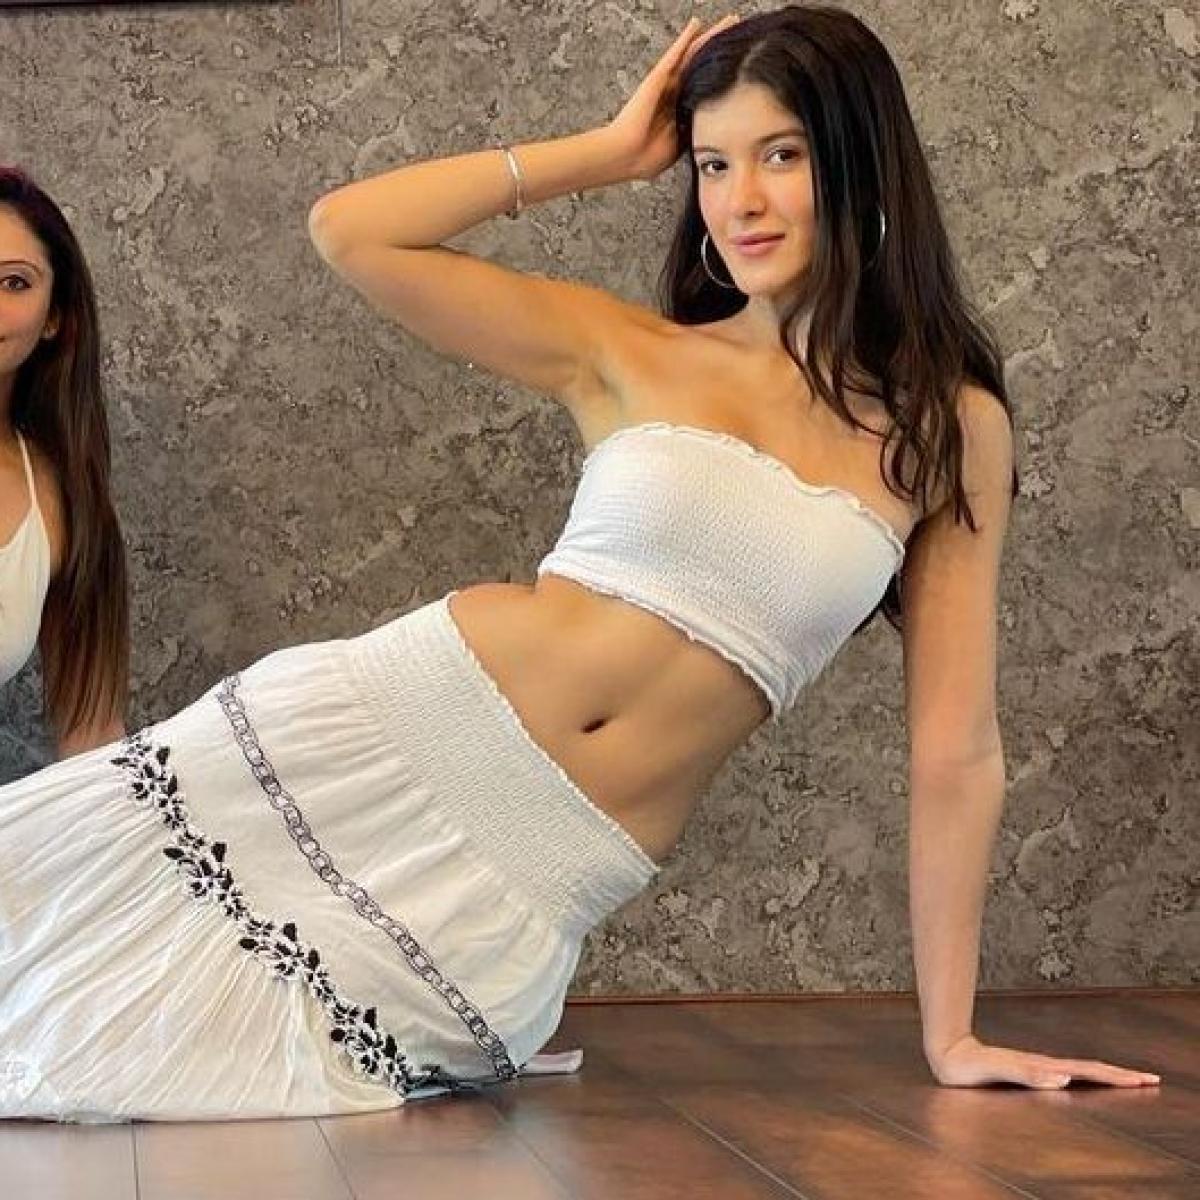 Watch: Shanaya Kapoor borrows bestie Suhana Khan's skirt for belly dancing lesson